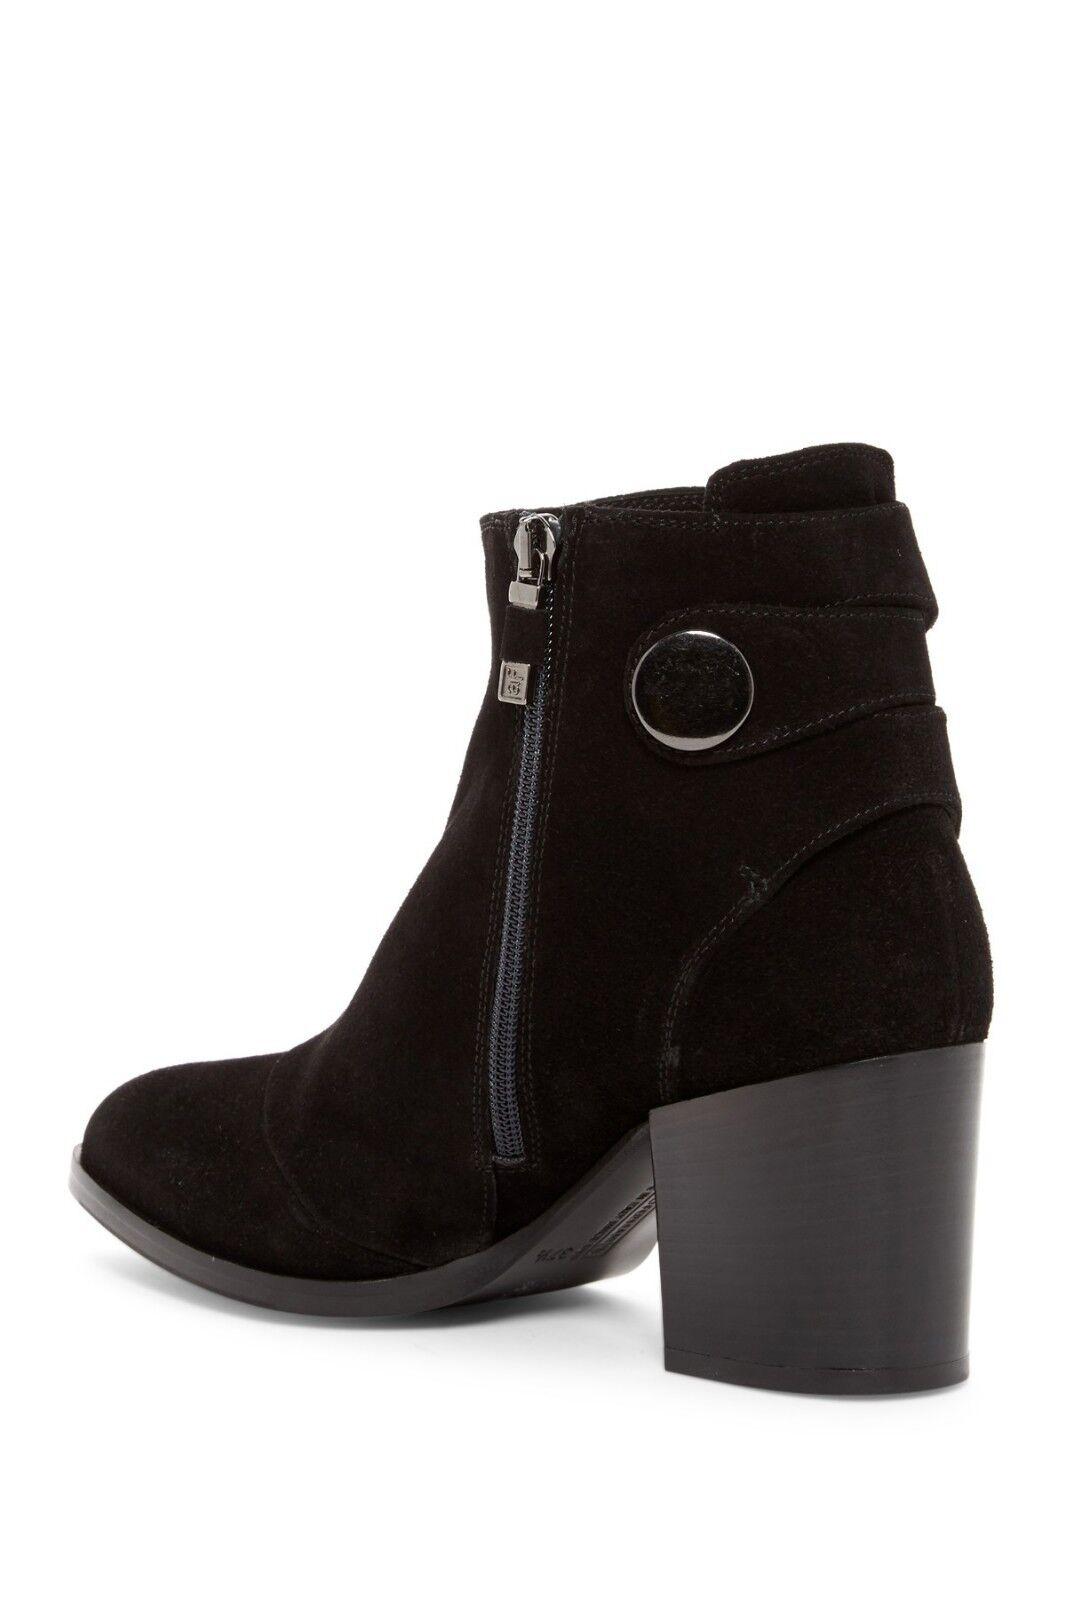 ALBERTO FERMANI Boots Tortora Black Leather Ankle Ankle Ankle Booties 40 EU 10 US  465 6cebaa